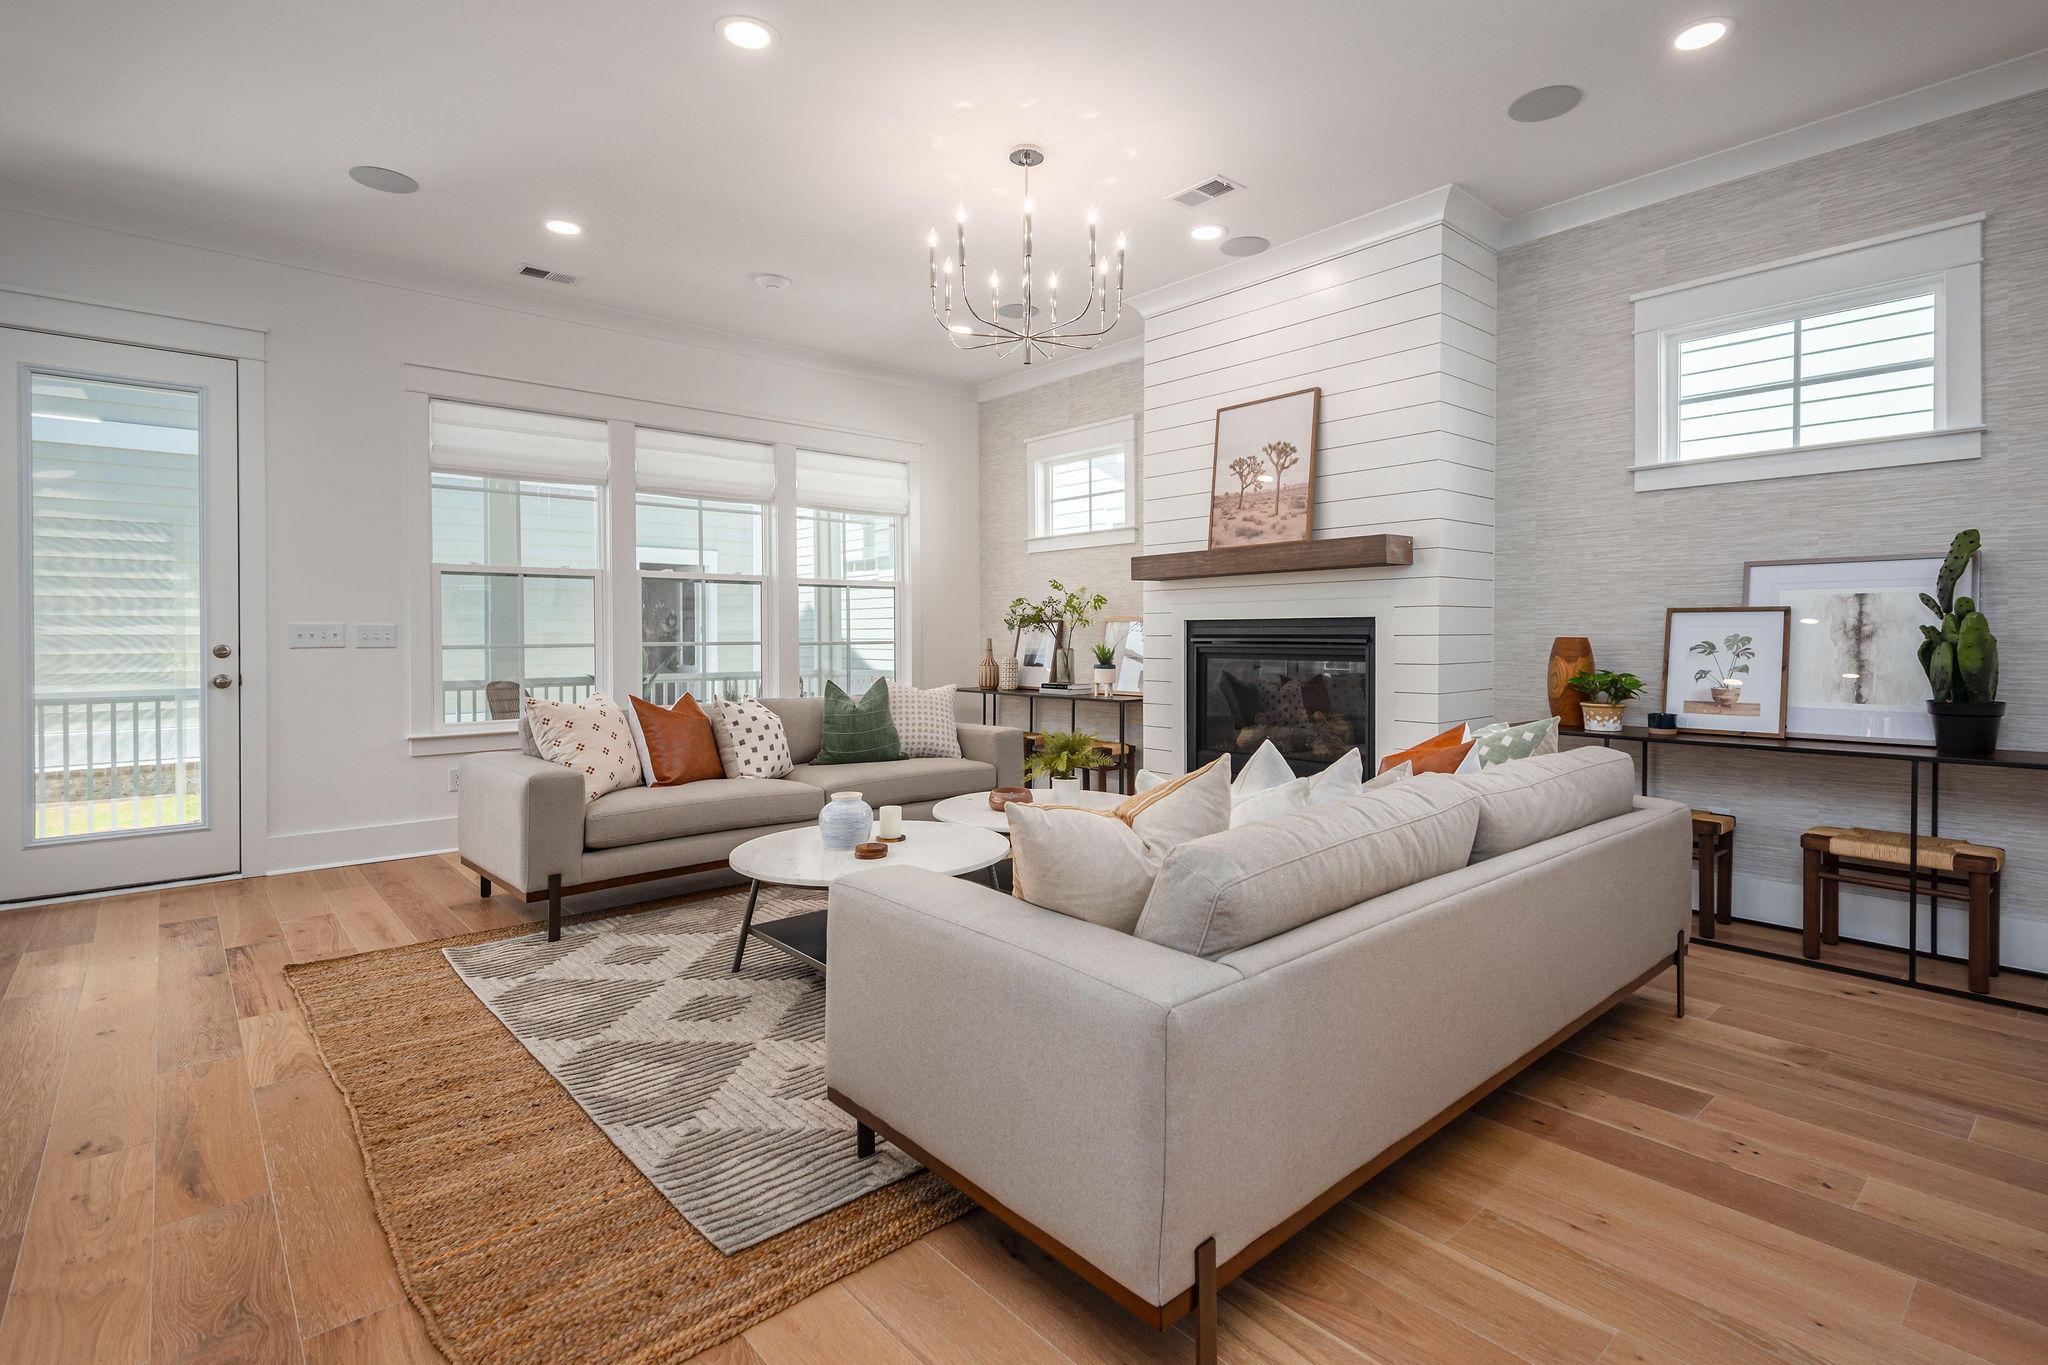 Midtown Homes For Sale - 1533 Kepley, Mount Pleasant, SC - 40